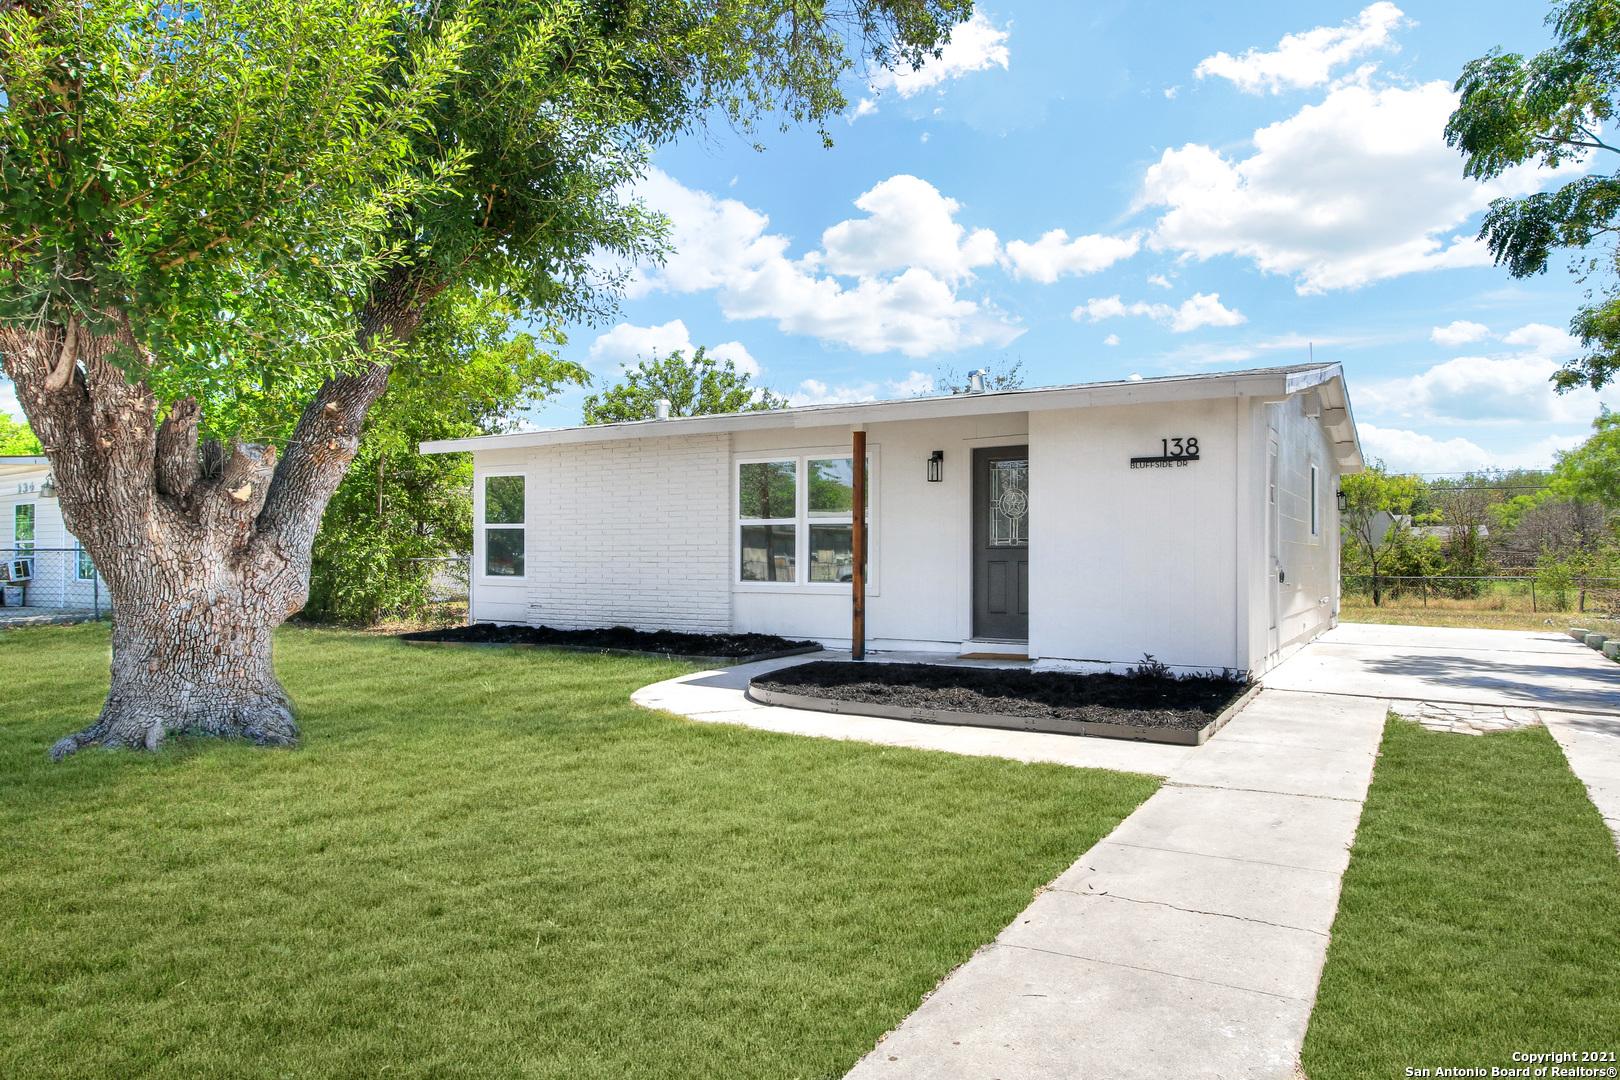 138 BLUFFSIDE DR, San Antonio, TX 78227